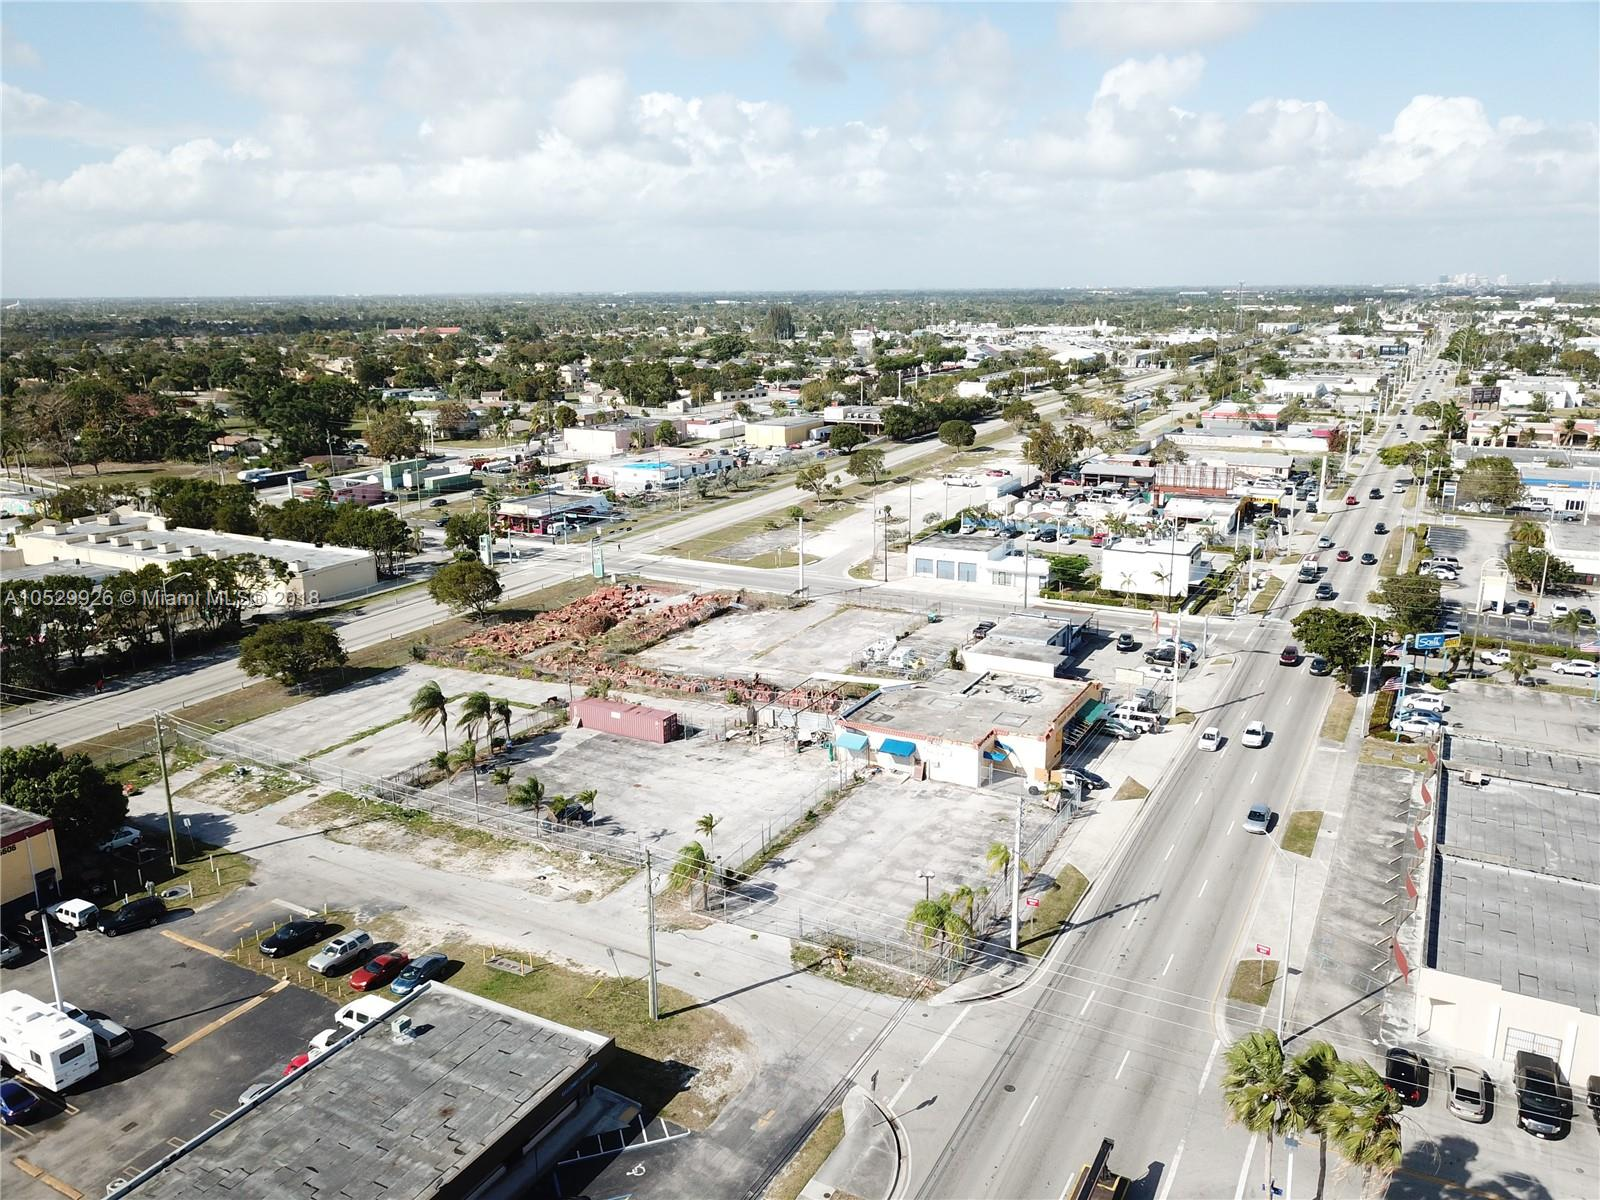 17832 S Dixie Hwy, Miami, FL 33157